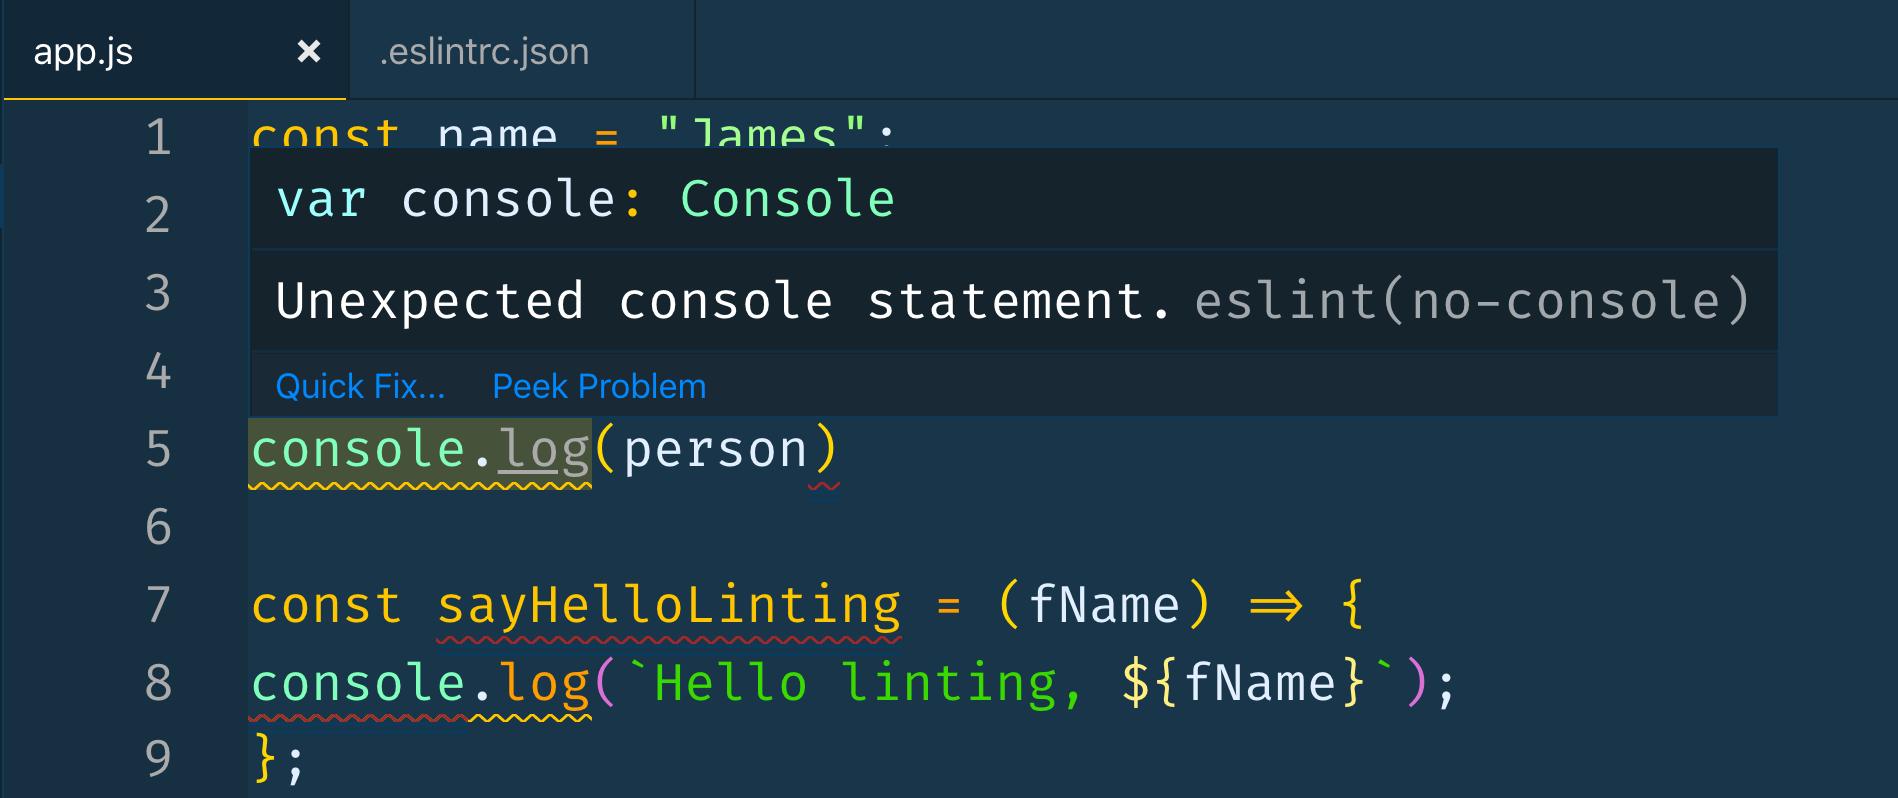 Console.log error